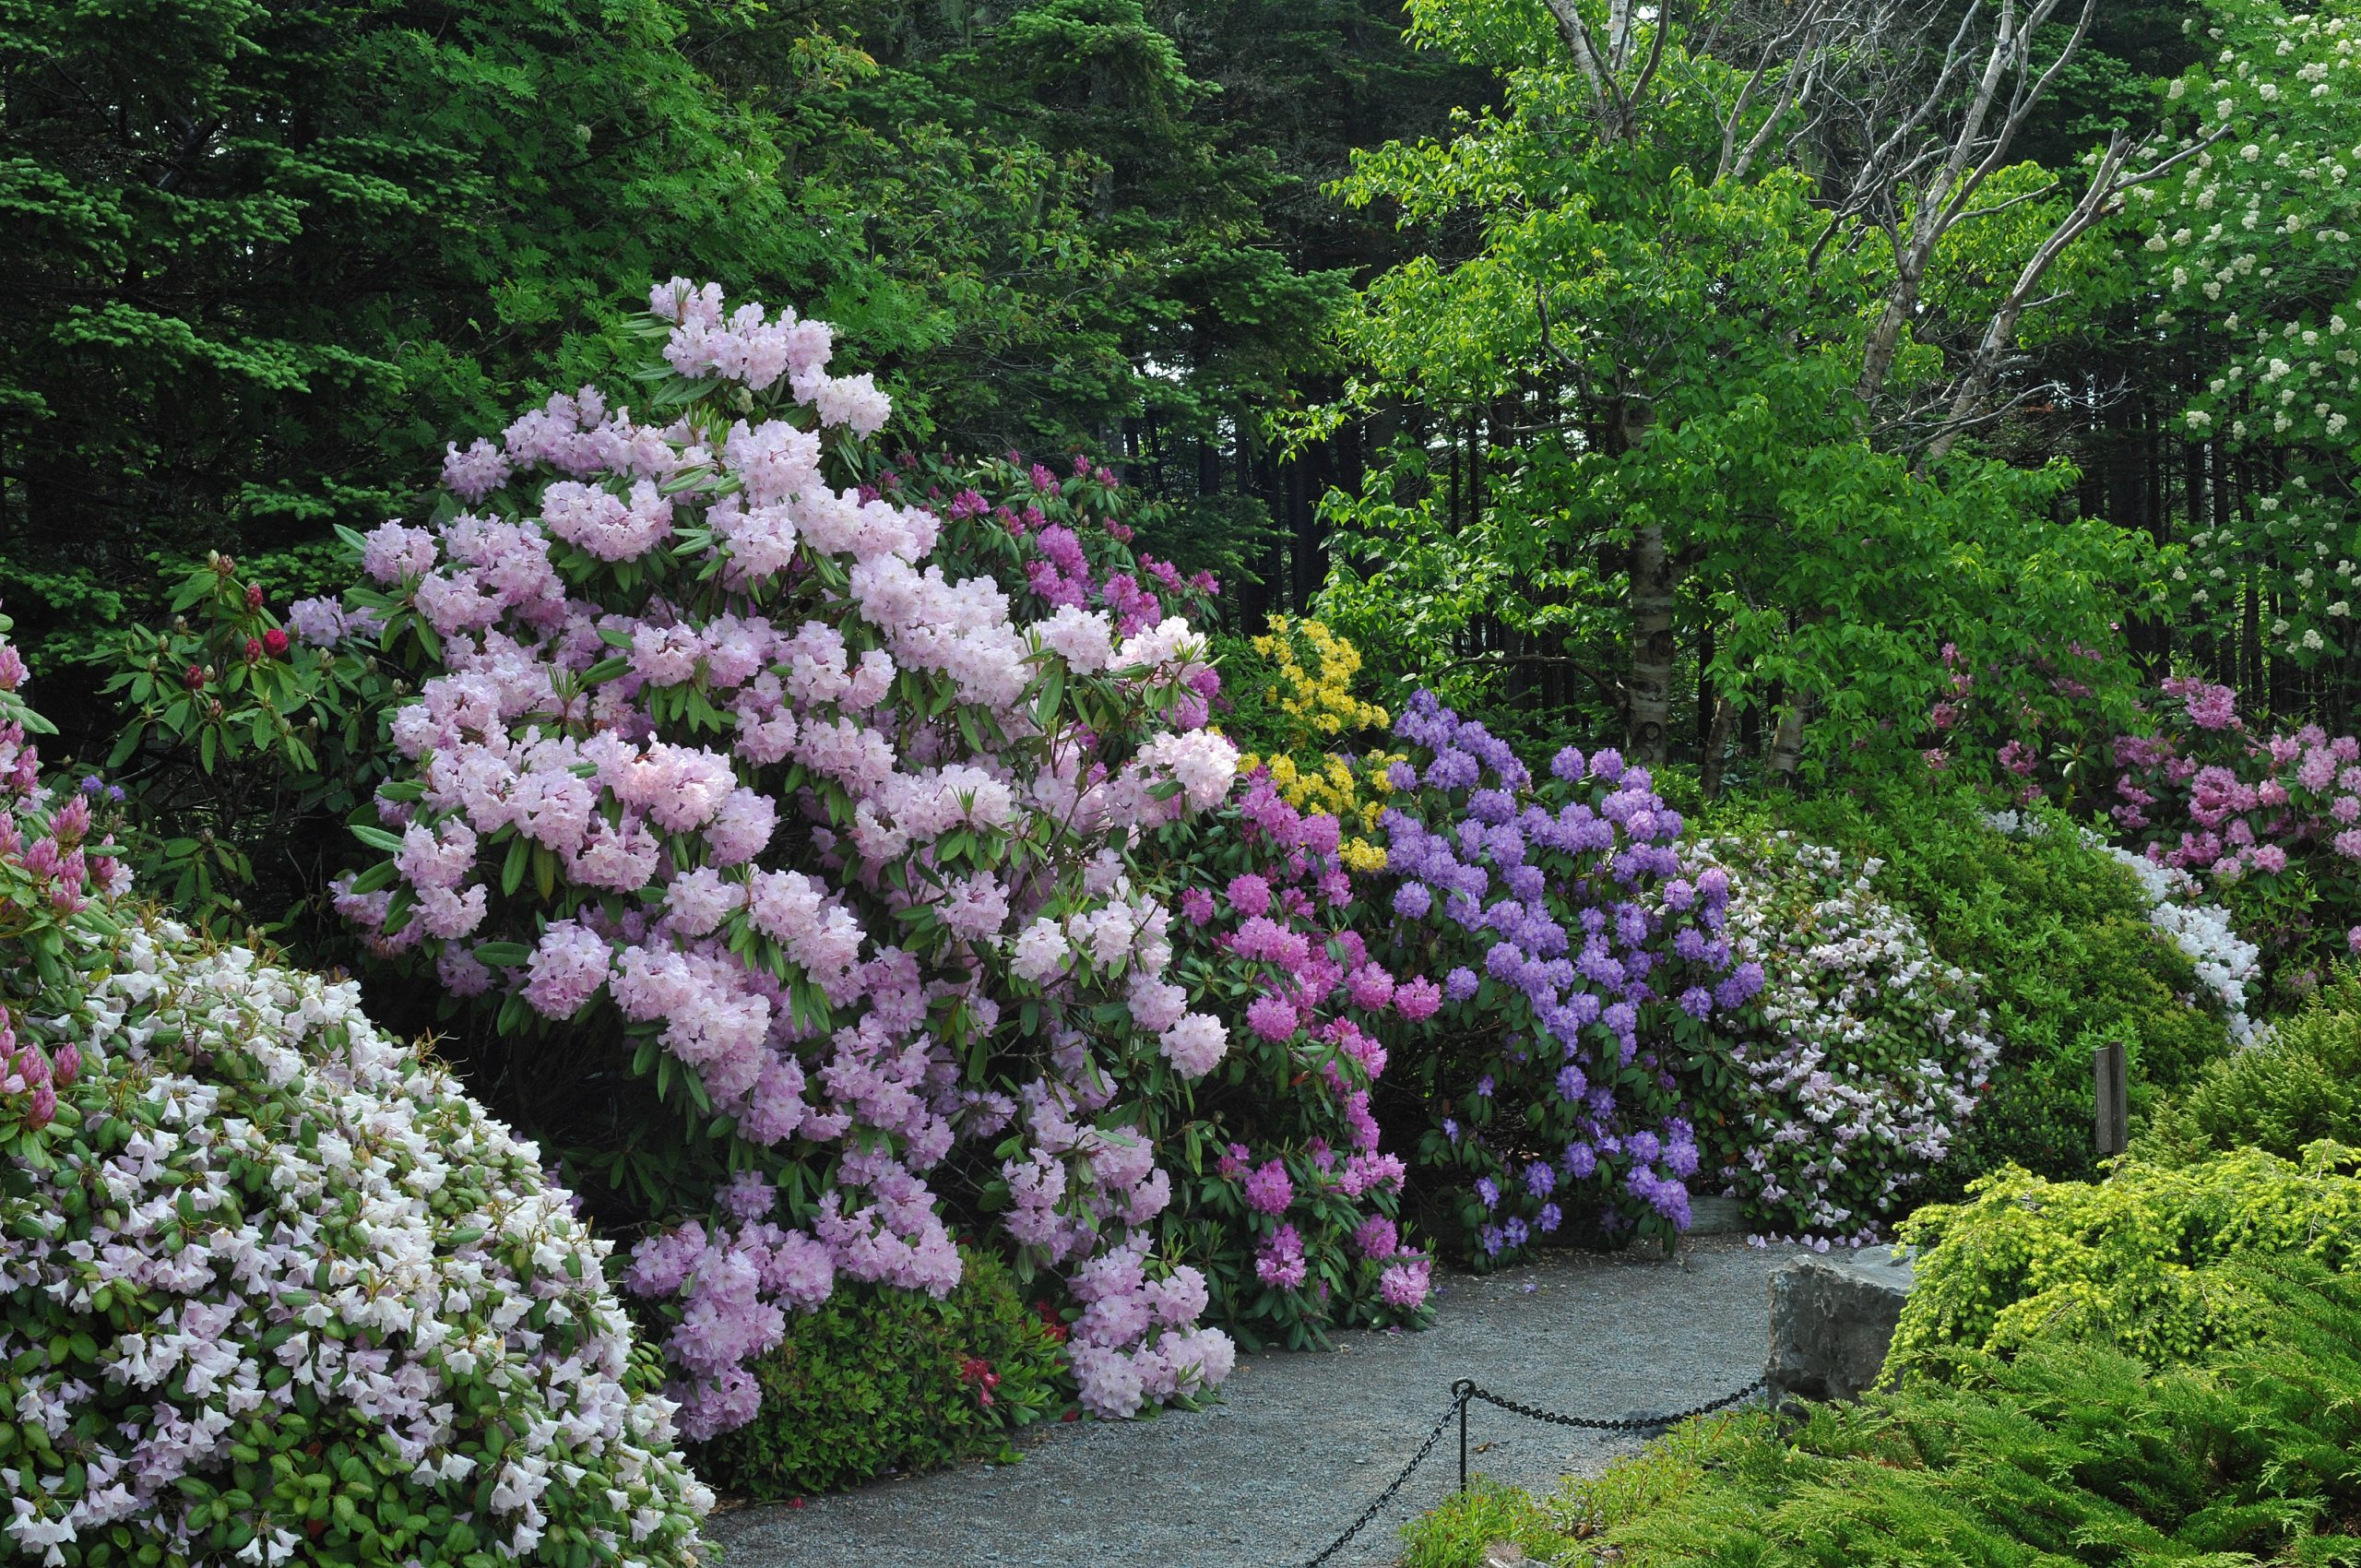 Newfoundland: Mun Botanical Garden Rhododendrons Credit Todd Boland